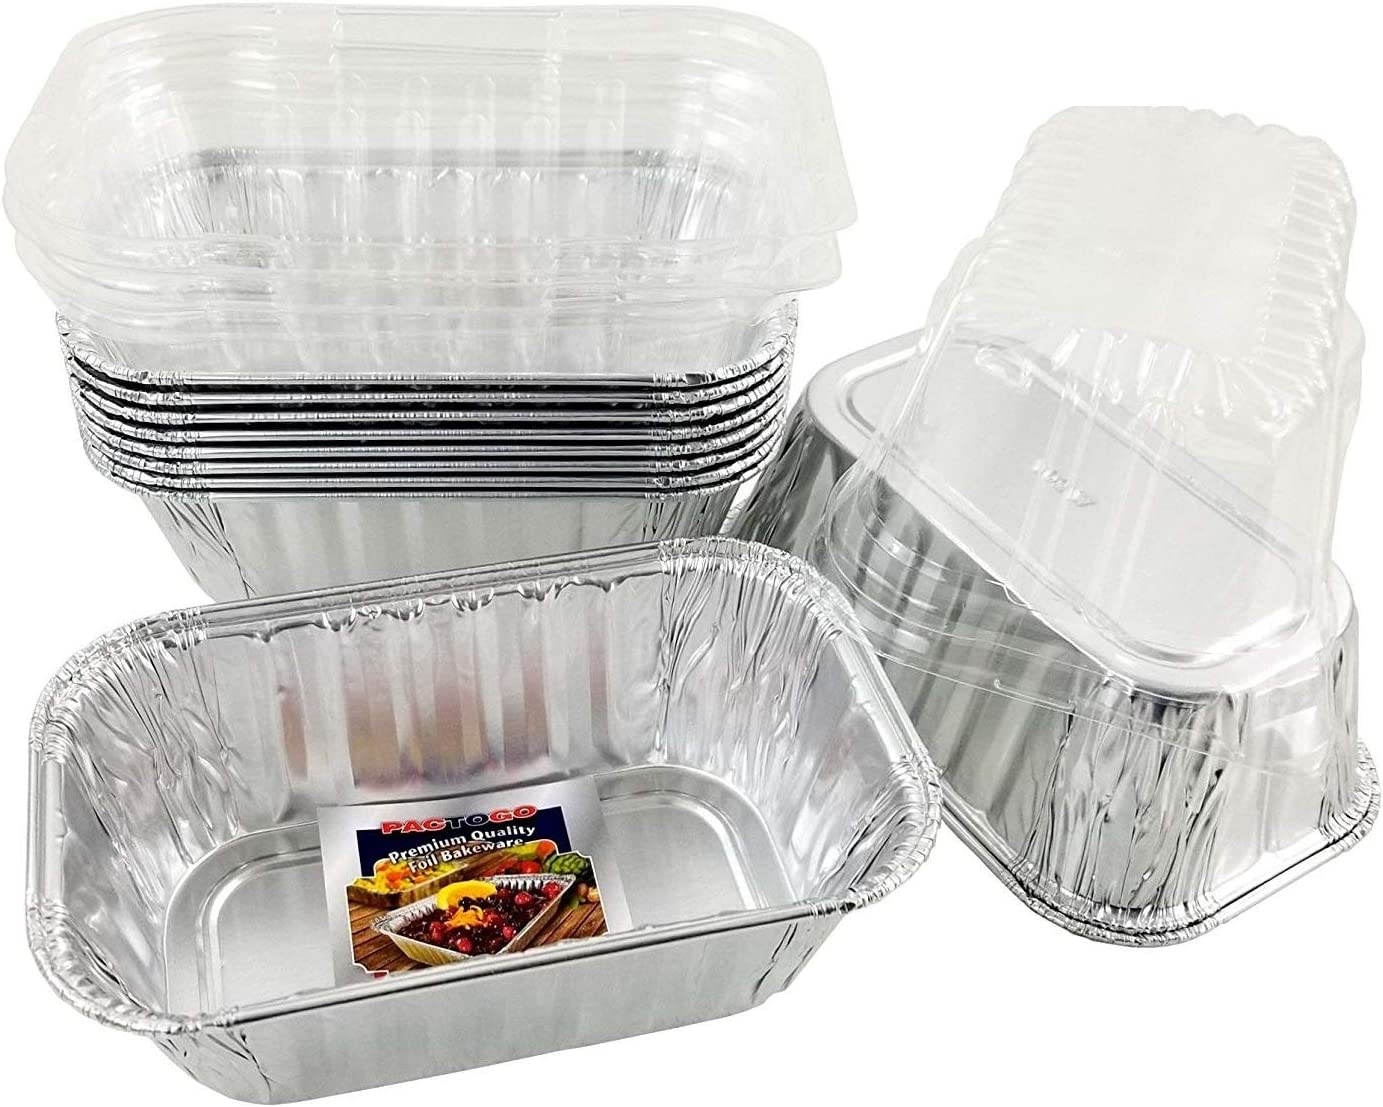 Pactogo Disposable 1 lb. Aluminum Foil Mini Loaf Pans with Clear Dome Lids (Pack of 40 Sets)